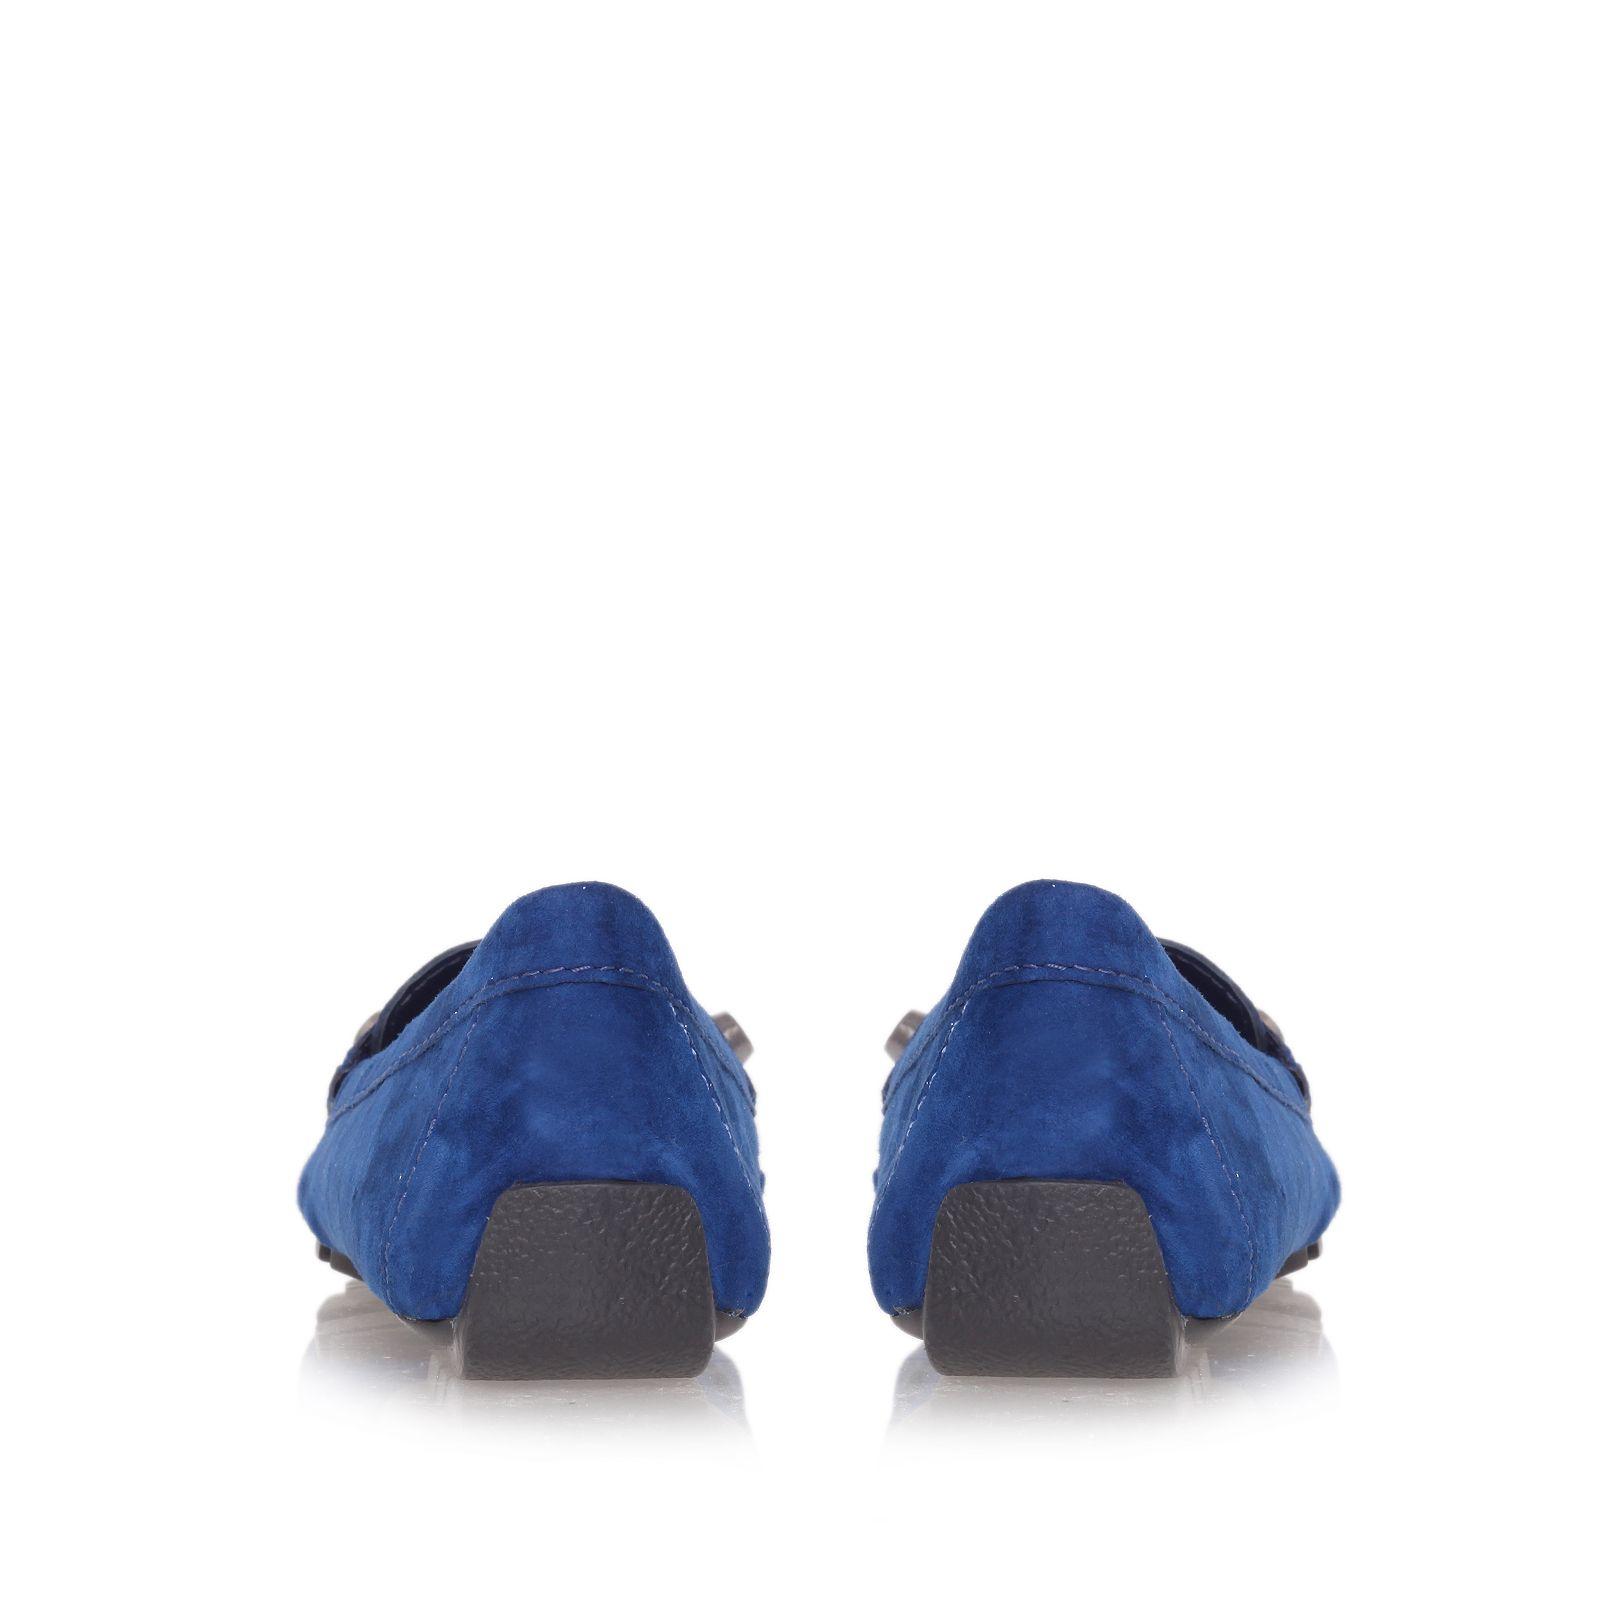 Lyst - Carvela Kurt Geiger Lily Driving Shoes In Blue For Men